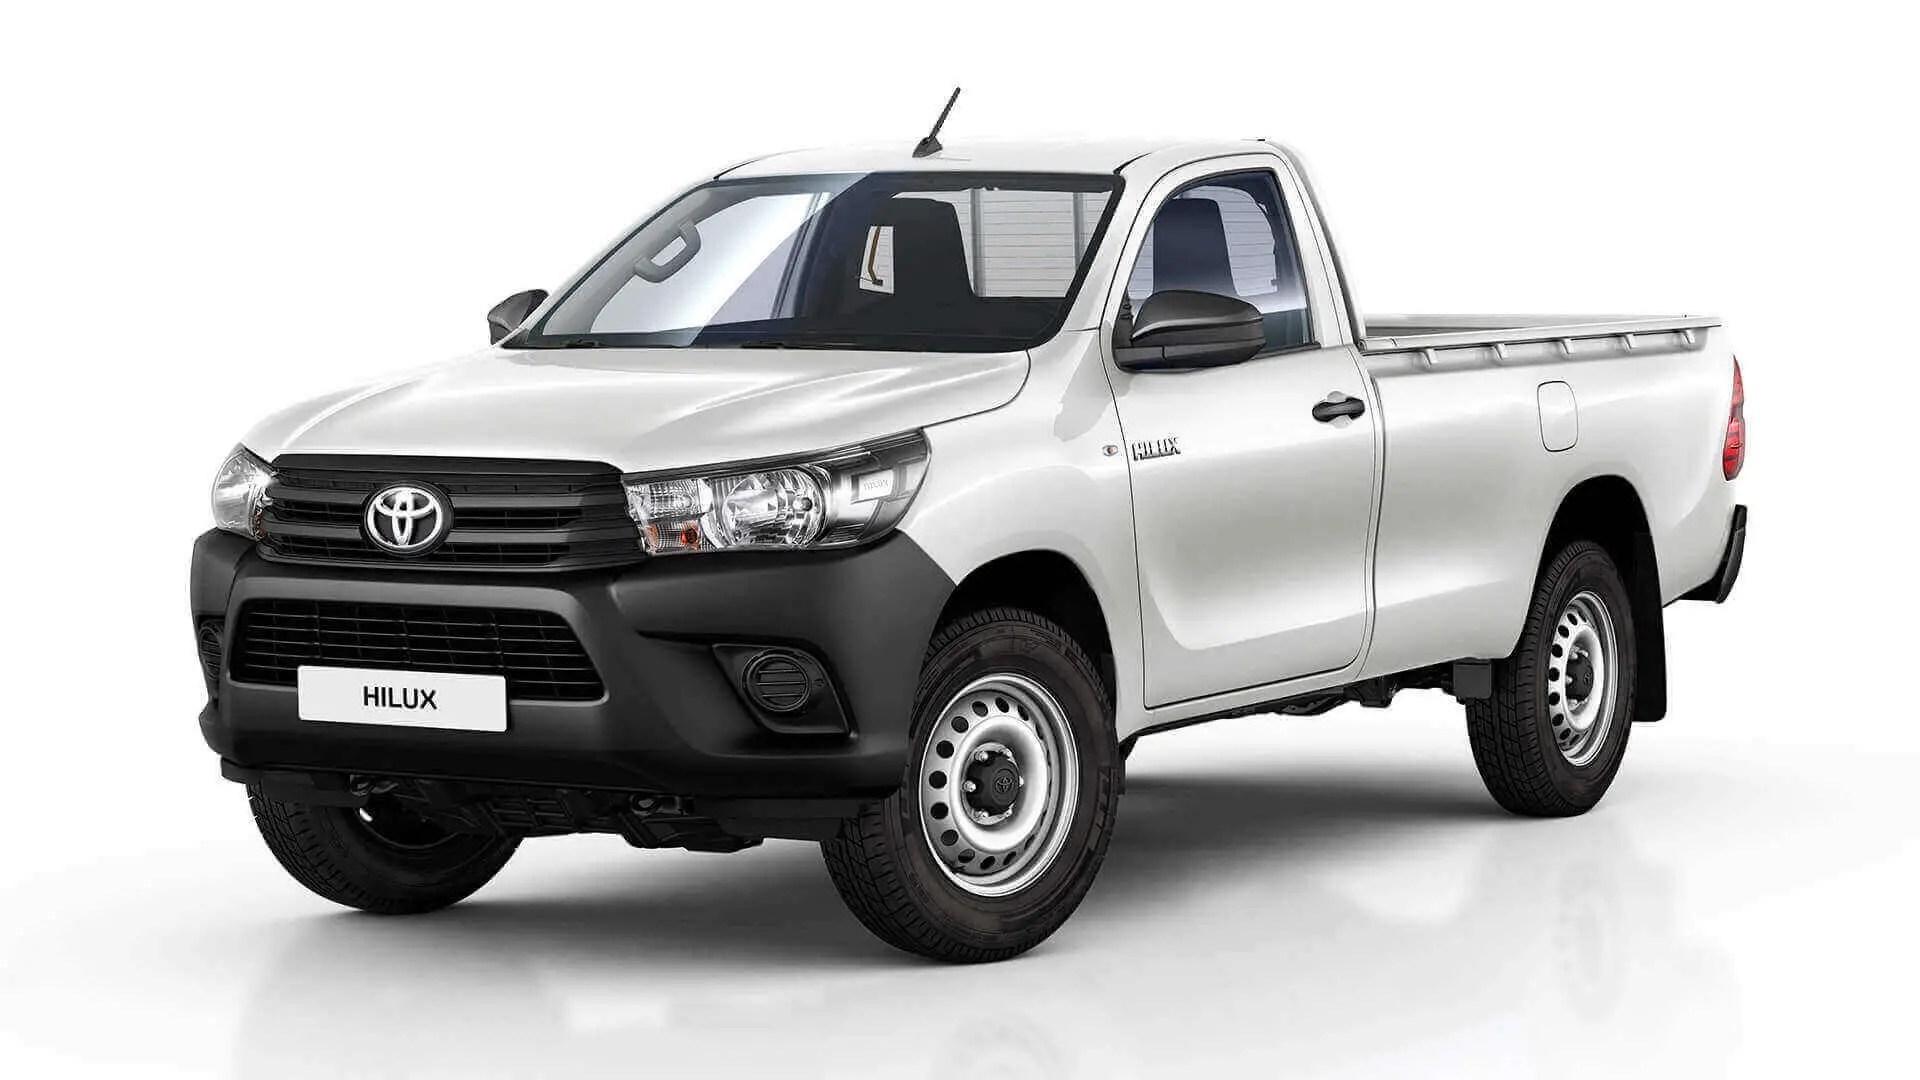 Toyota Hilux Mod BUSSID, Mod Toyota Hilux BUSSID, Mod Toyota Hilux Truck BUSSID